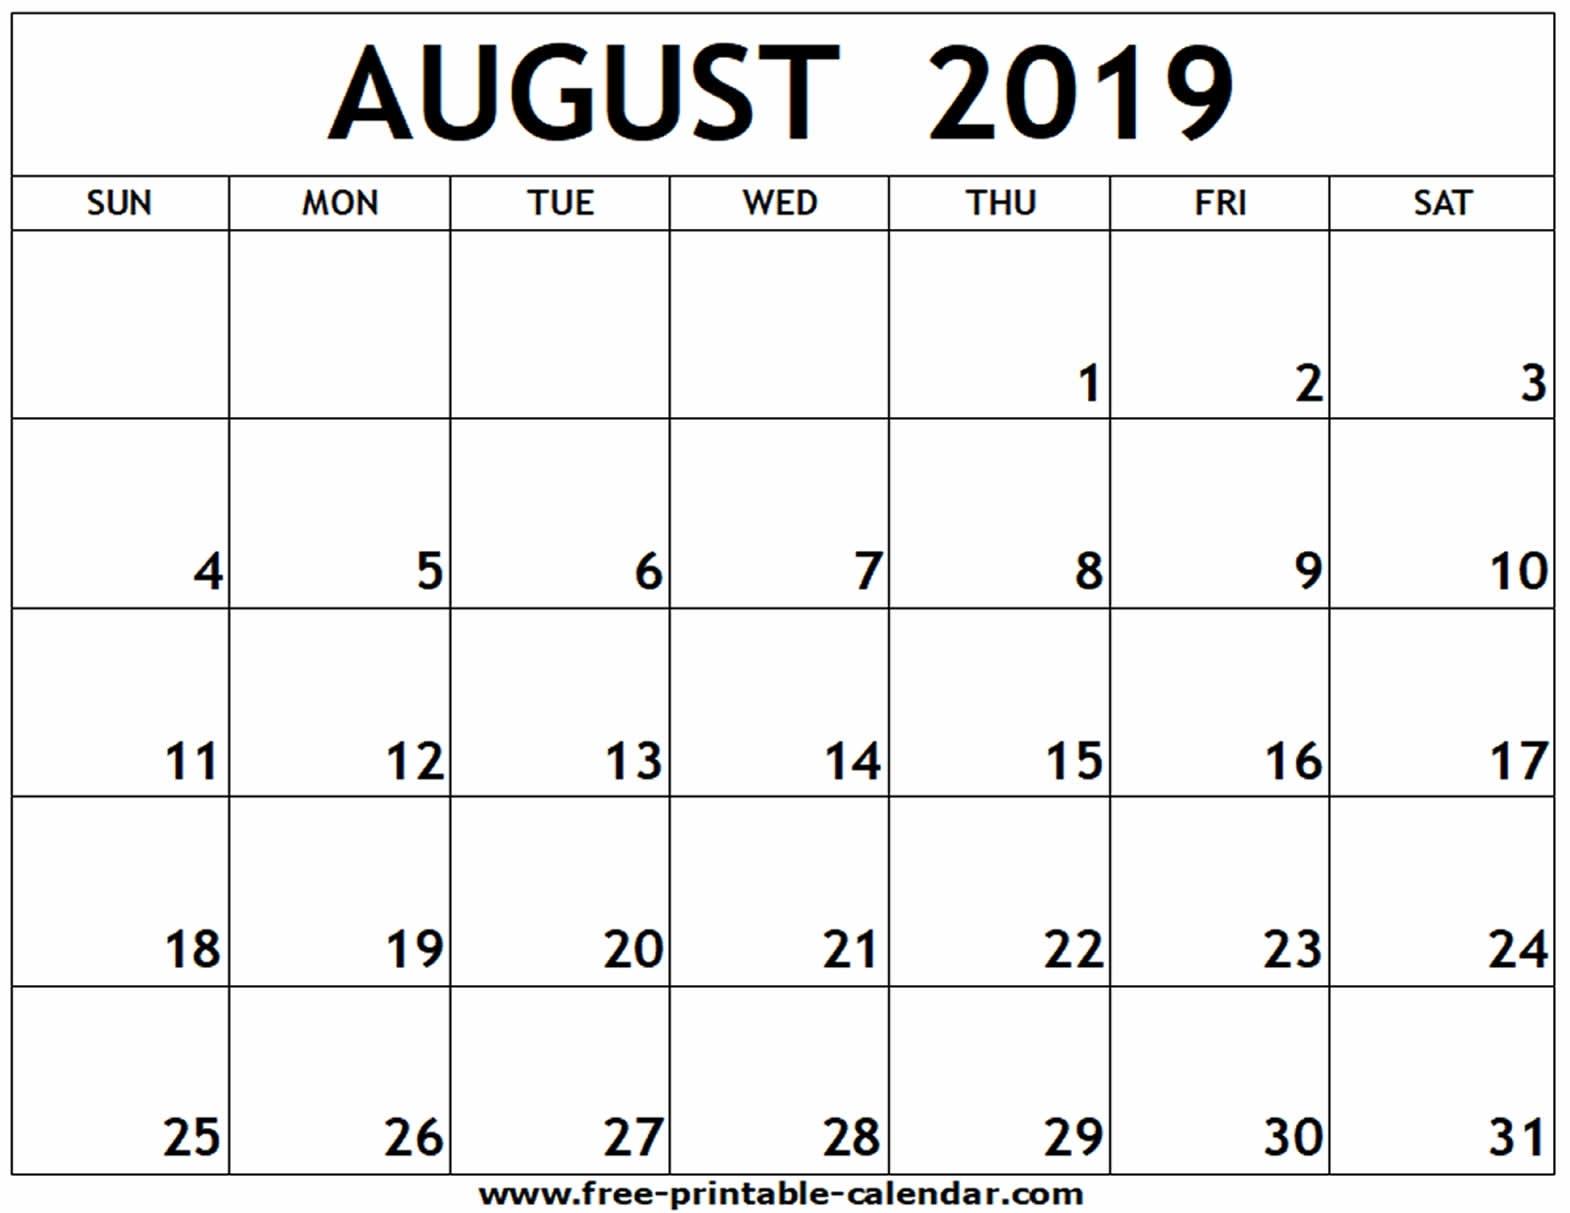 August 2019 Printable Calendar - Free-Printable-Calendar within Numbers Free Printable Calendar For August